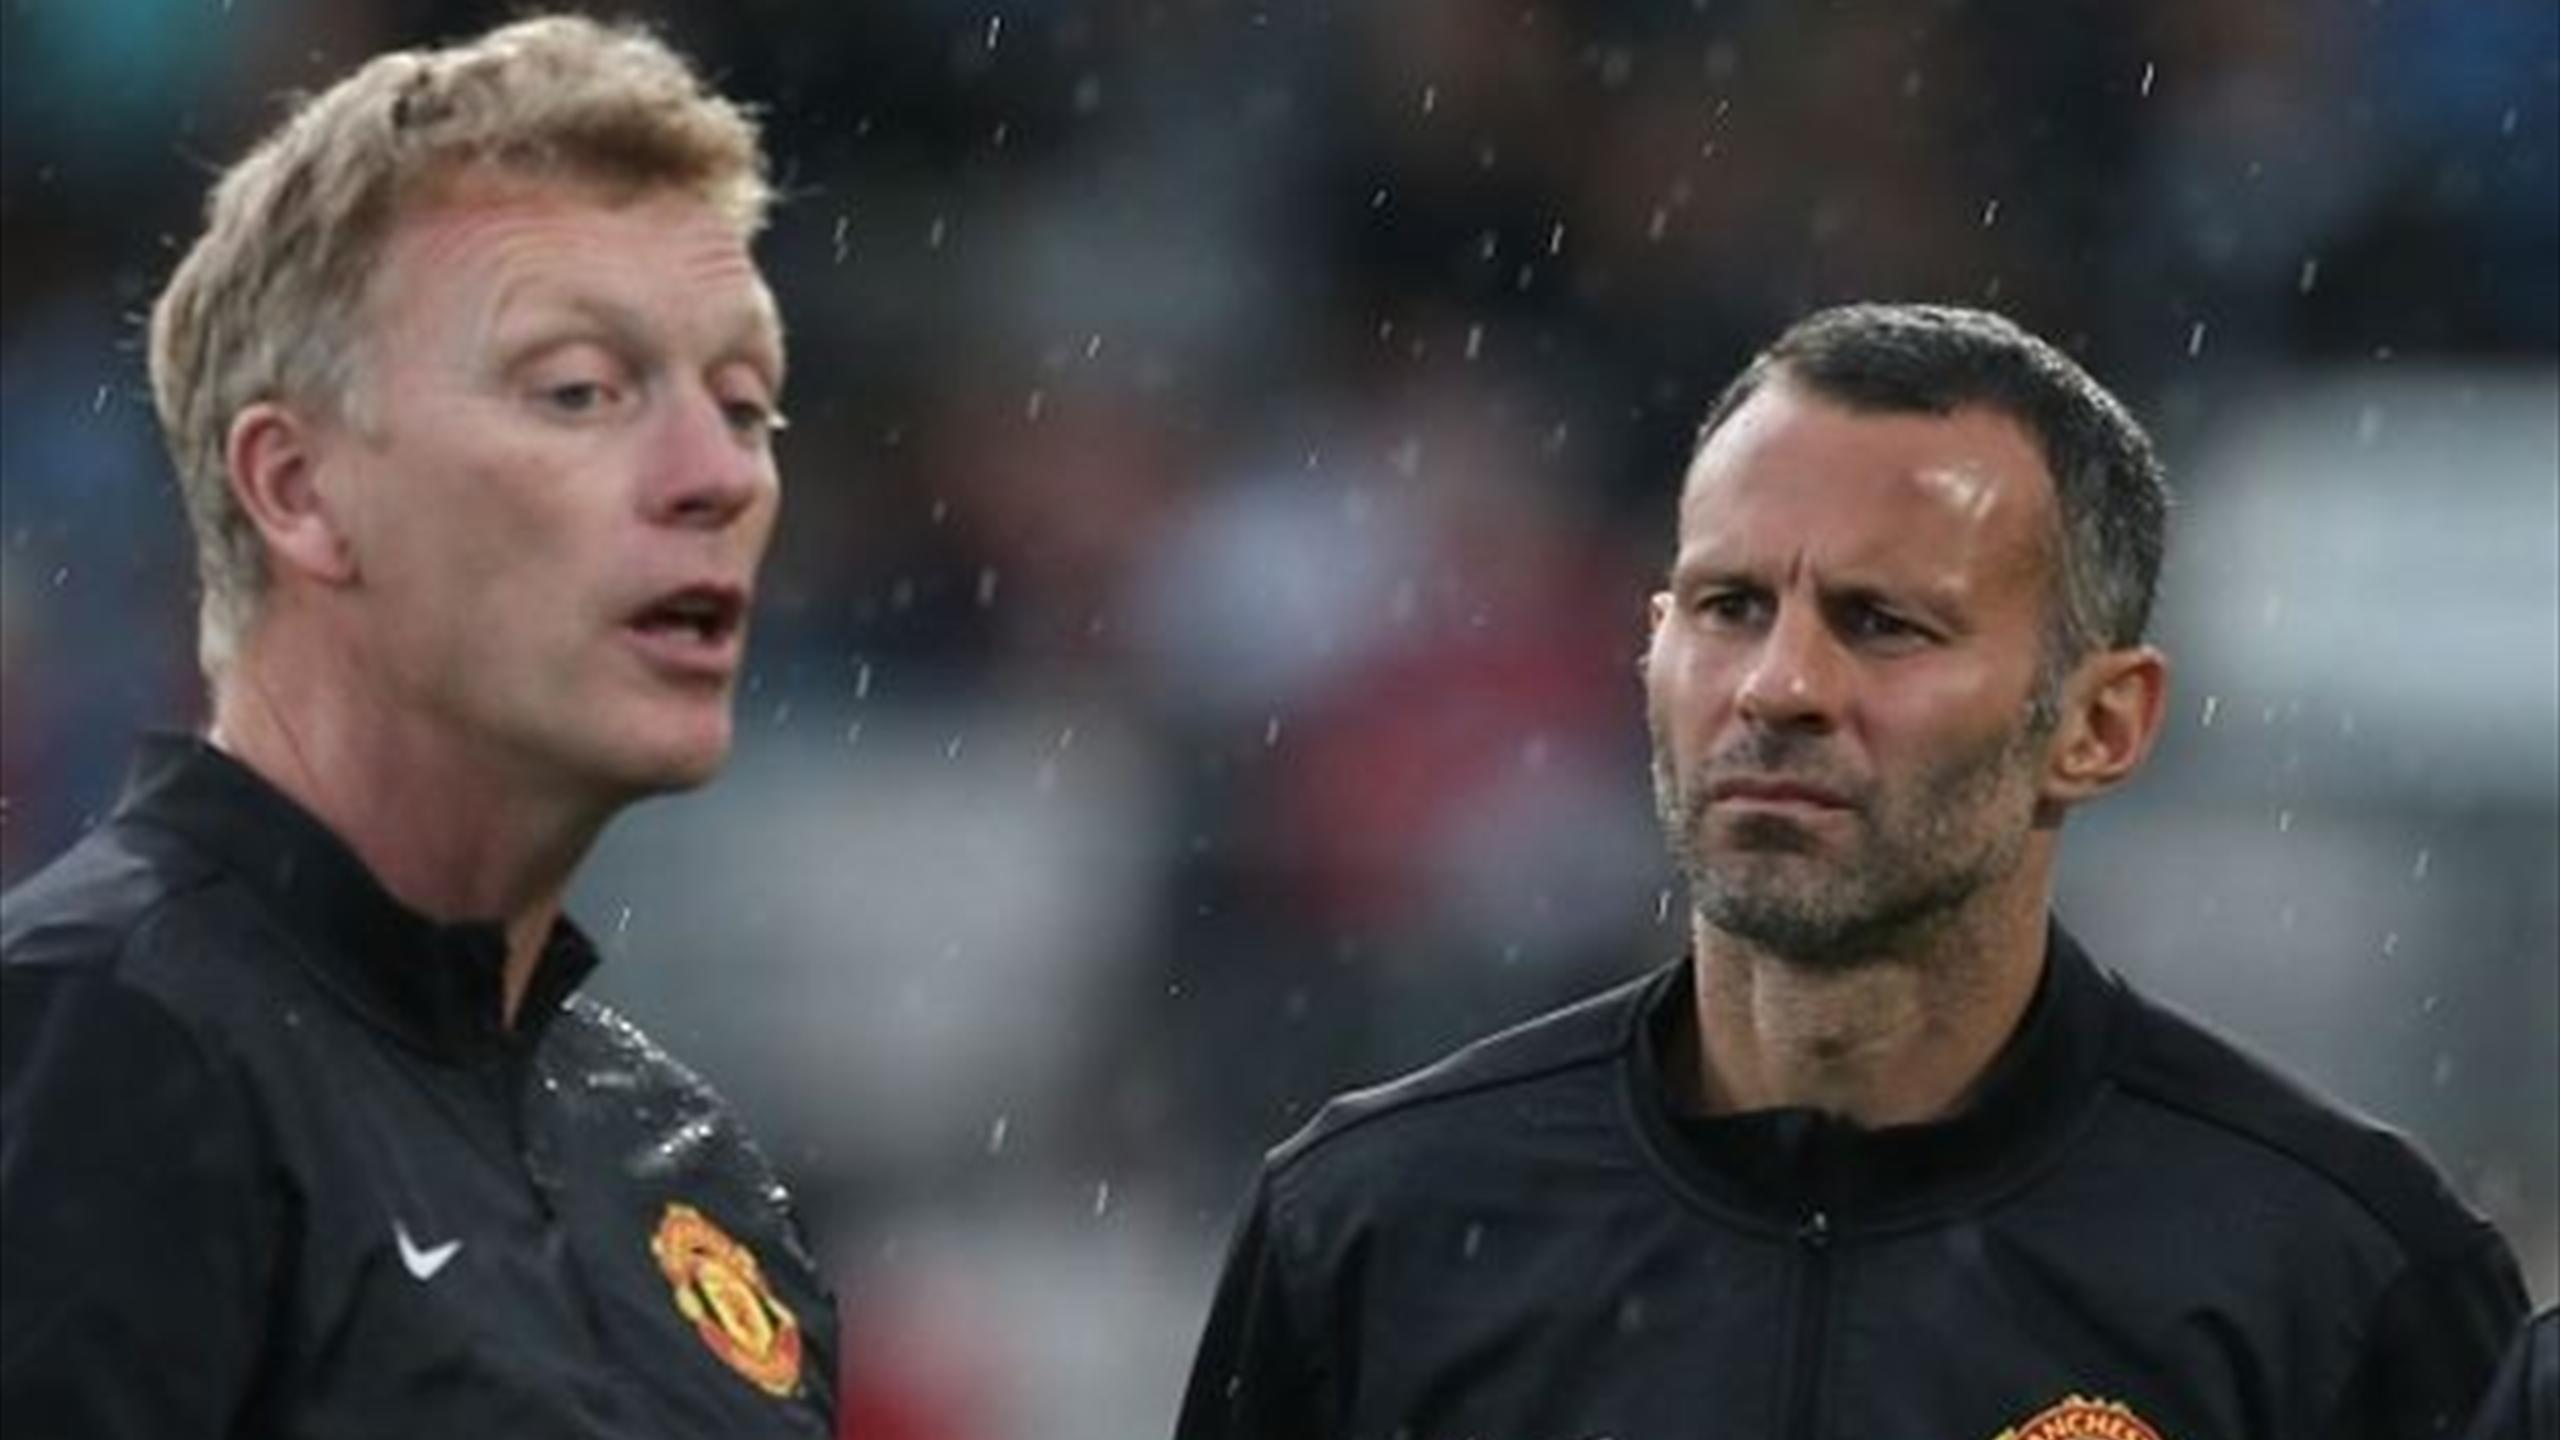 Ryan Giggs entraîneur de Manchester United par intérim ...Ryan Giggs 2013 2014